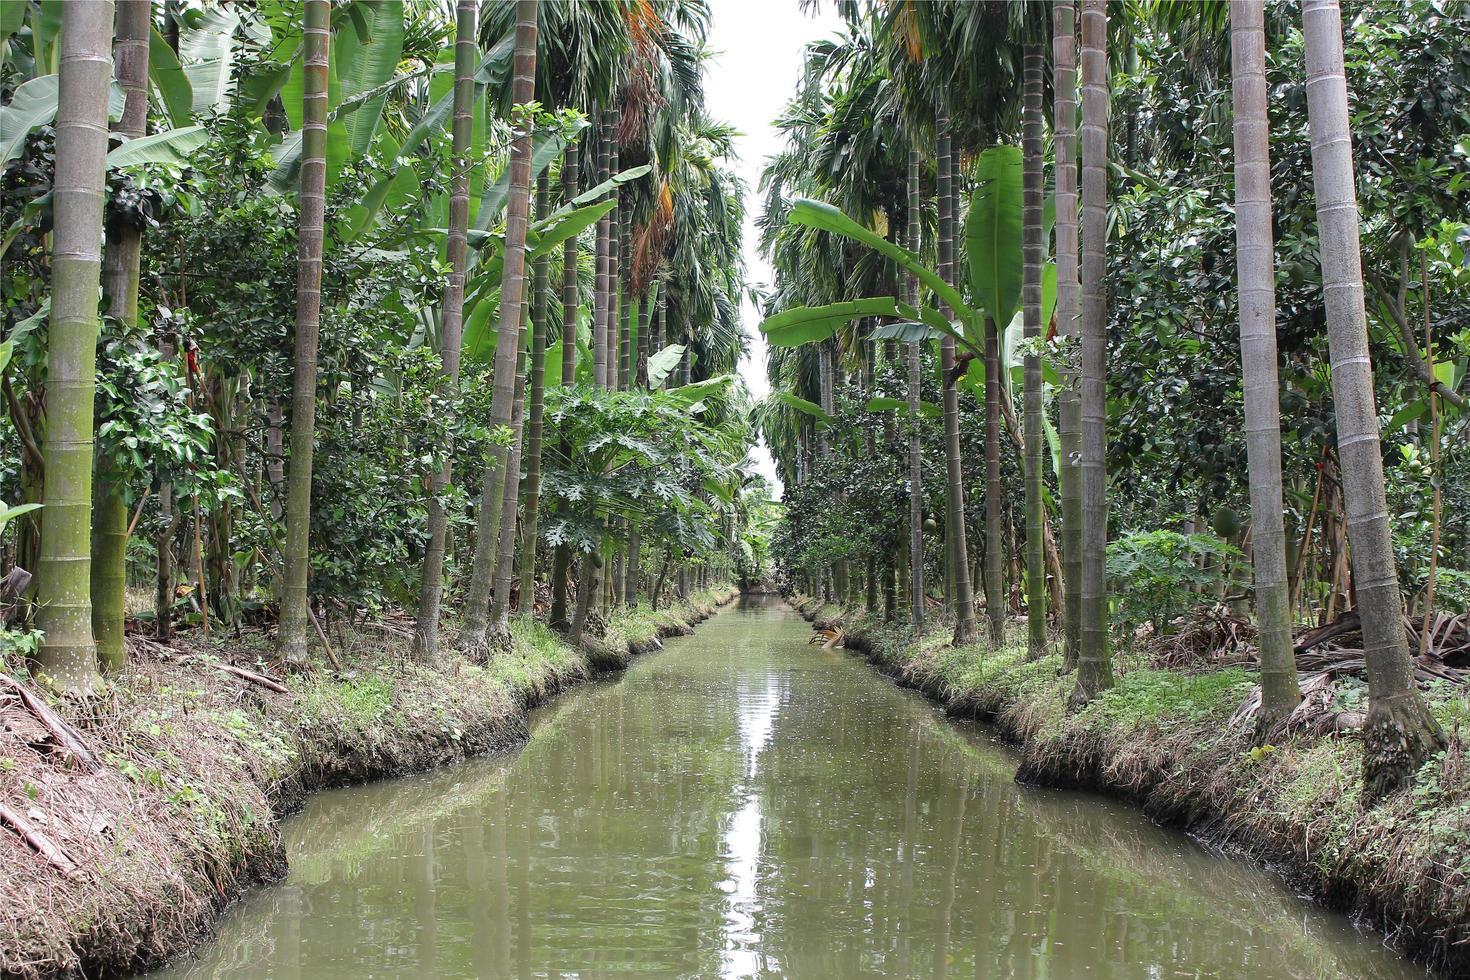 ruisseau dans une jungle photo